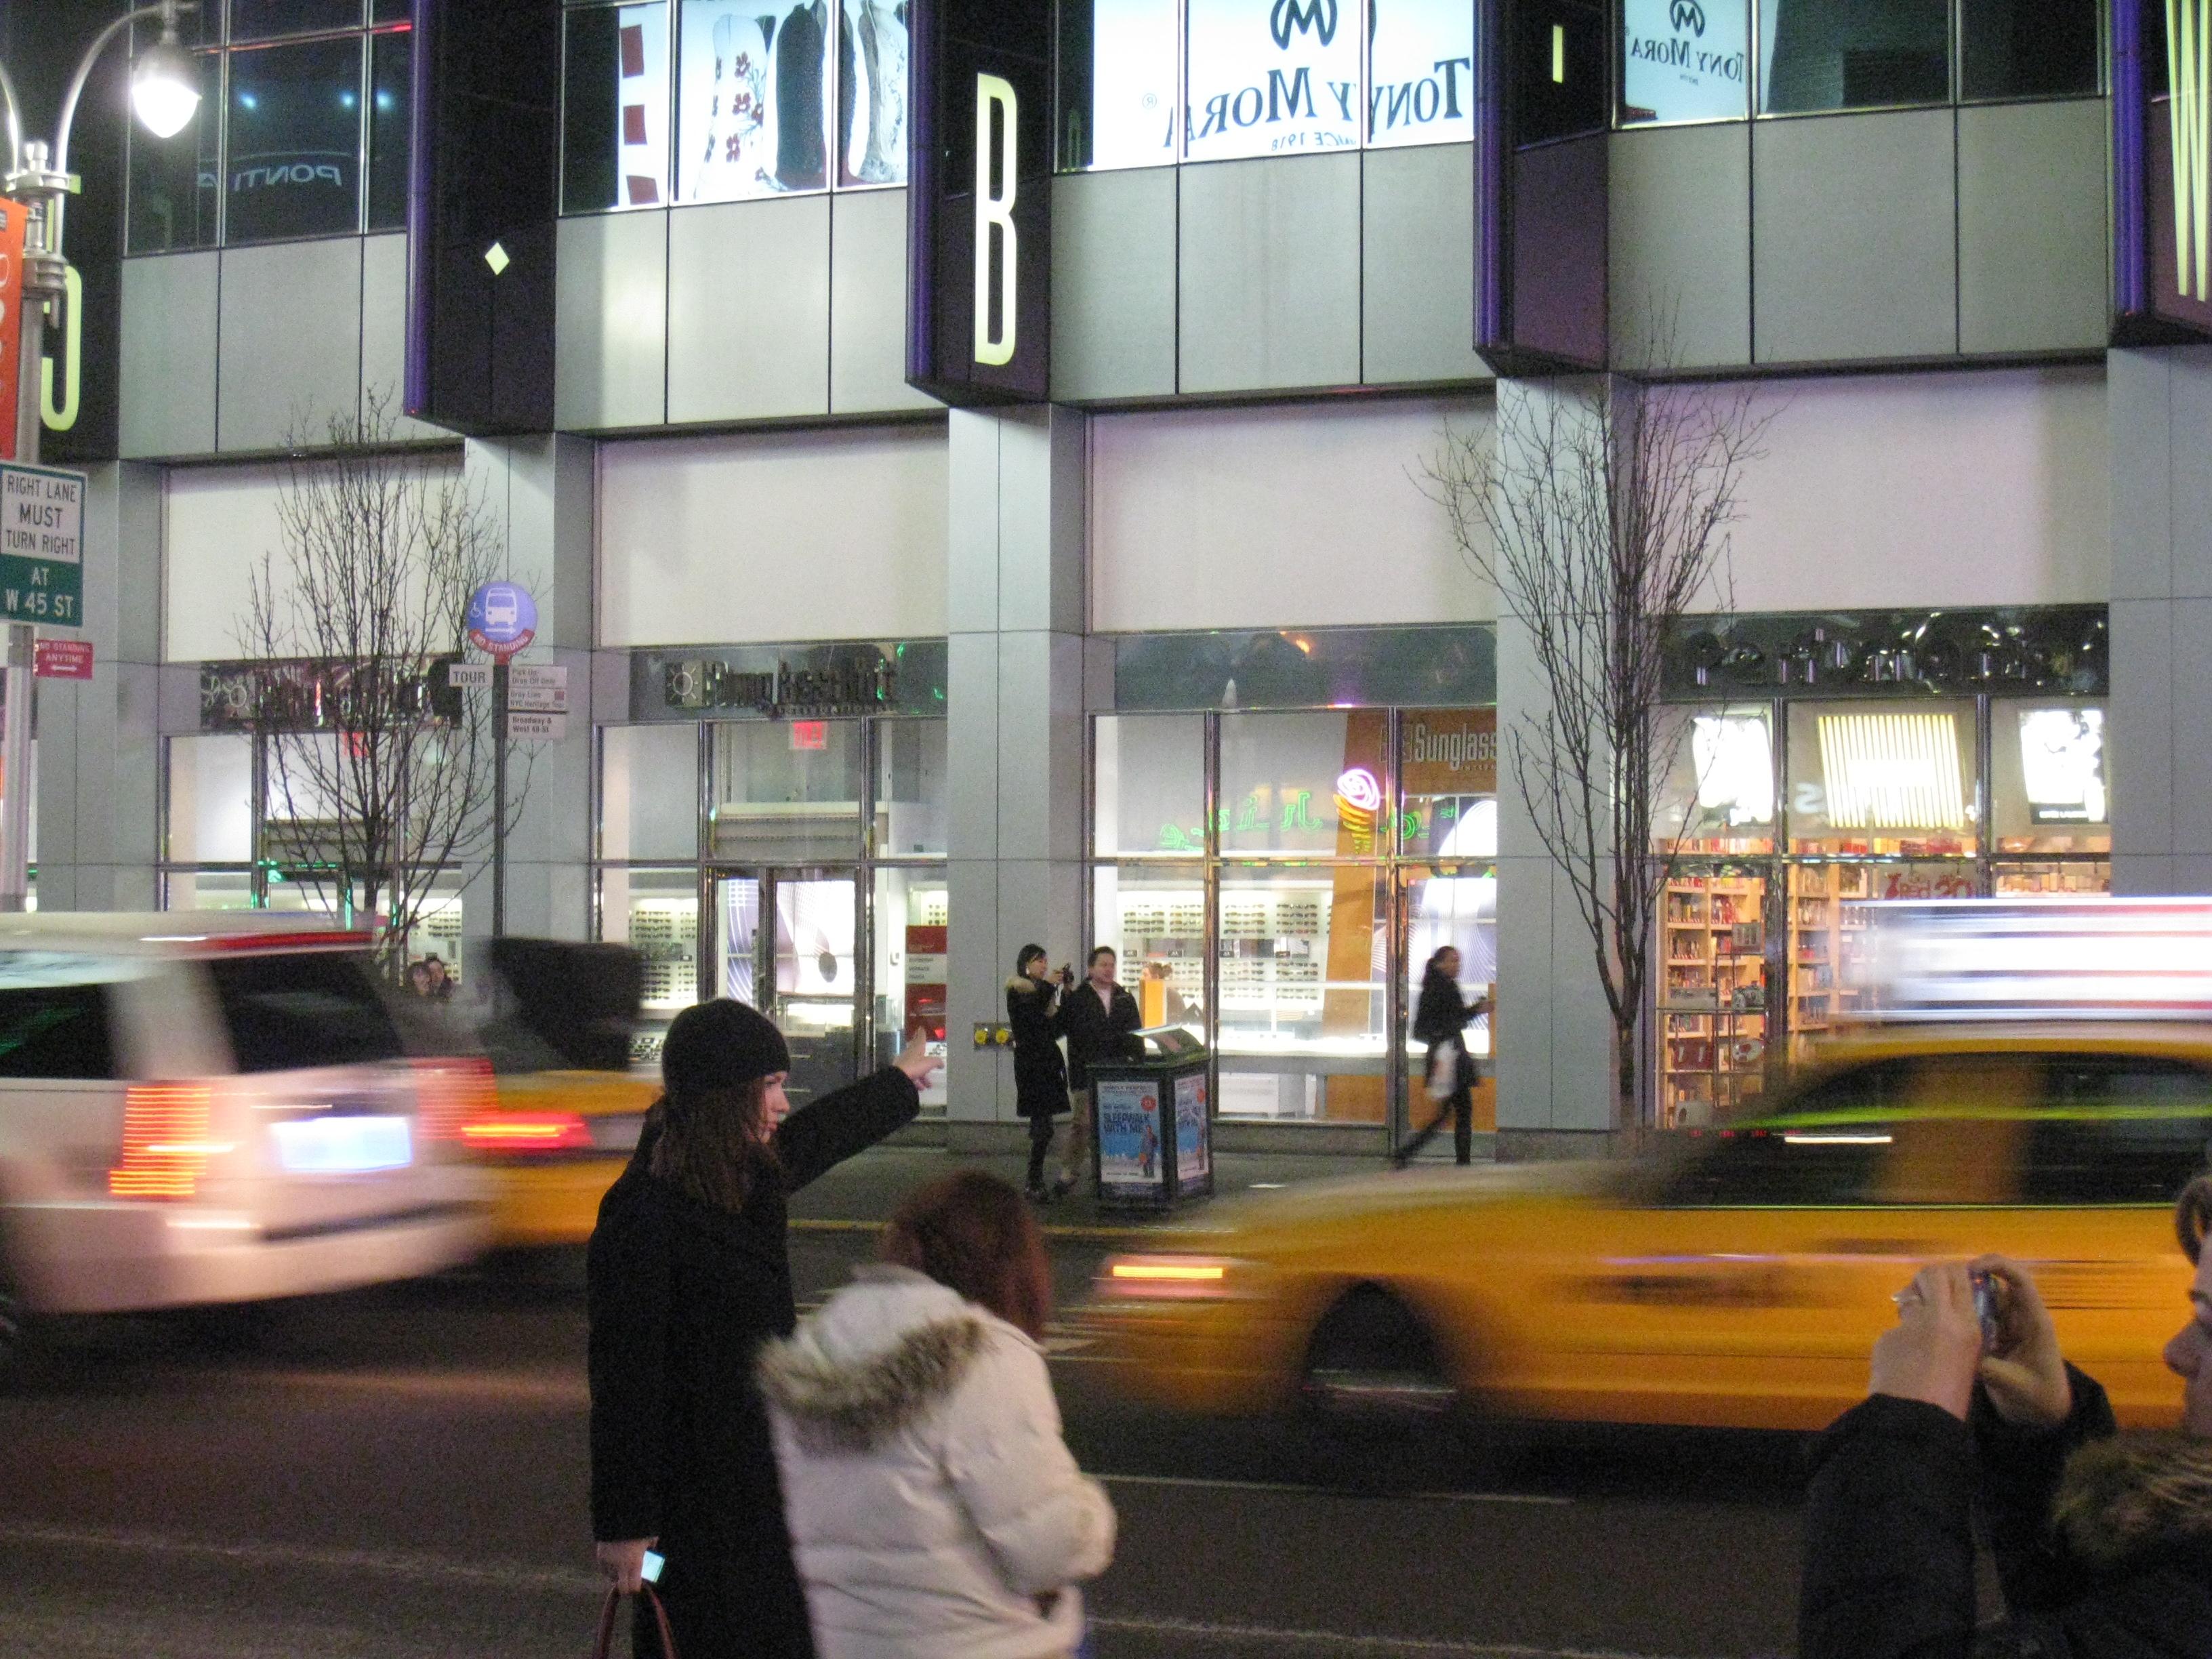 amy-new-york-trip-feb-2009-093